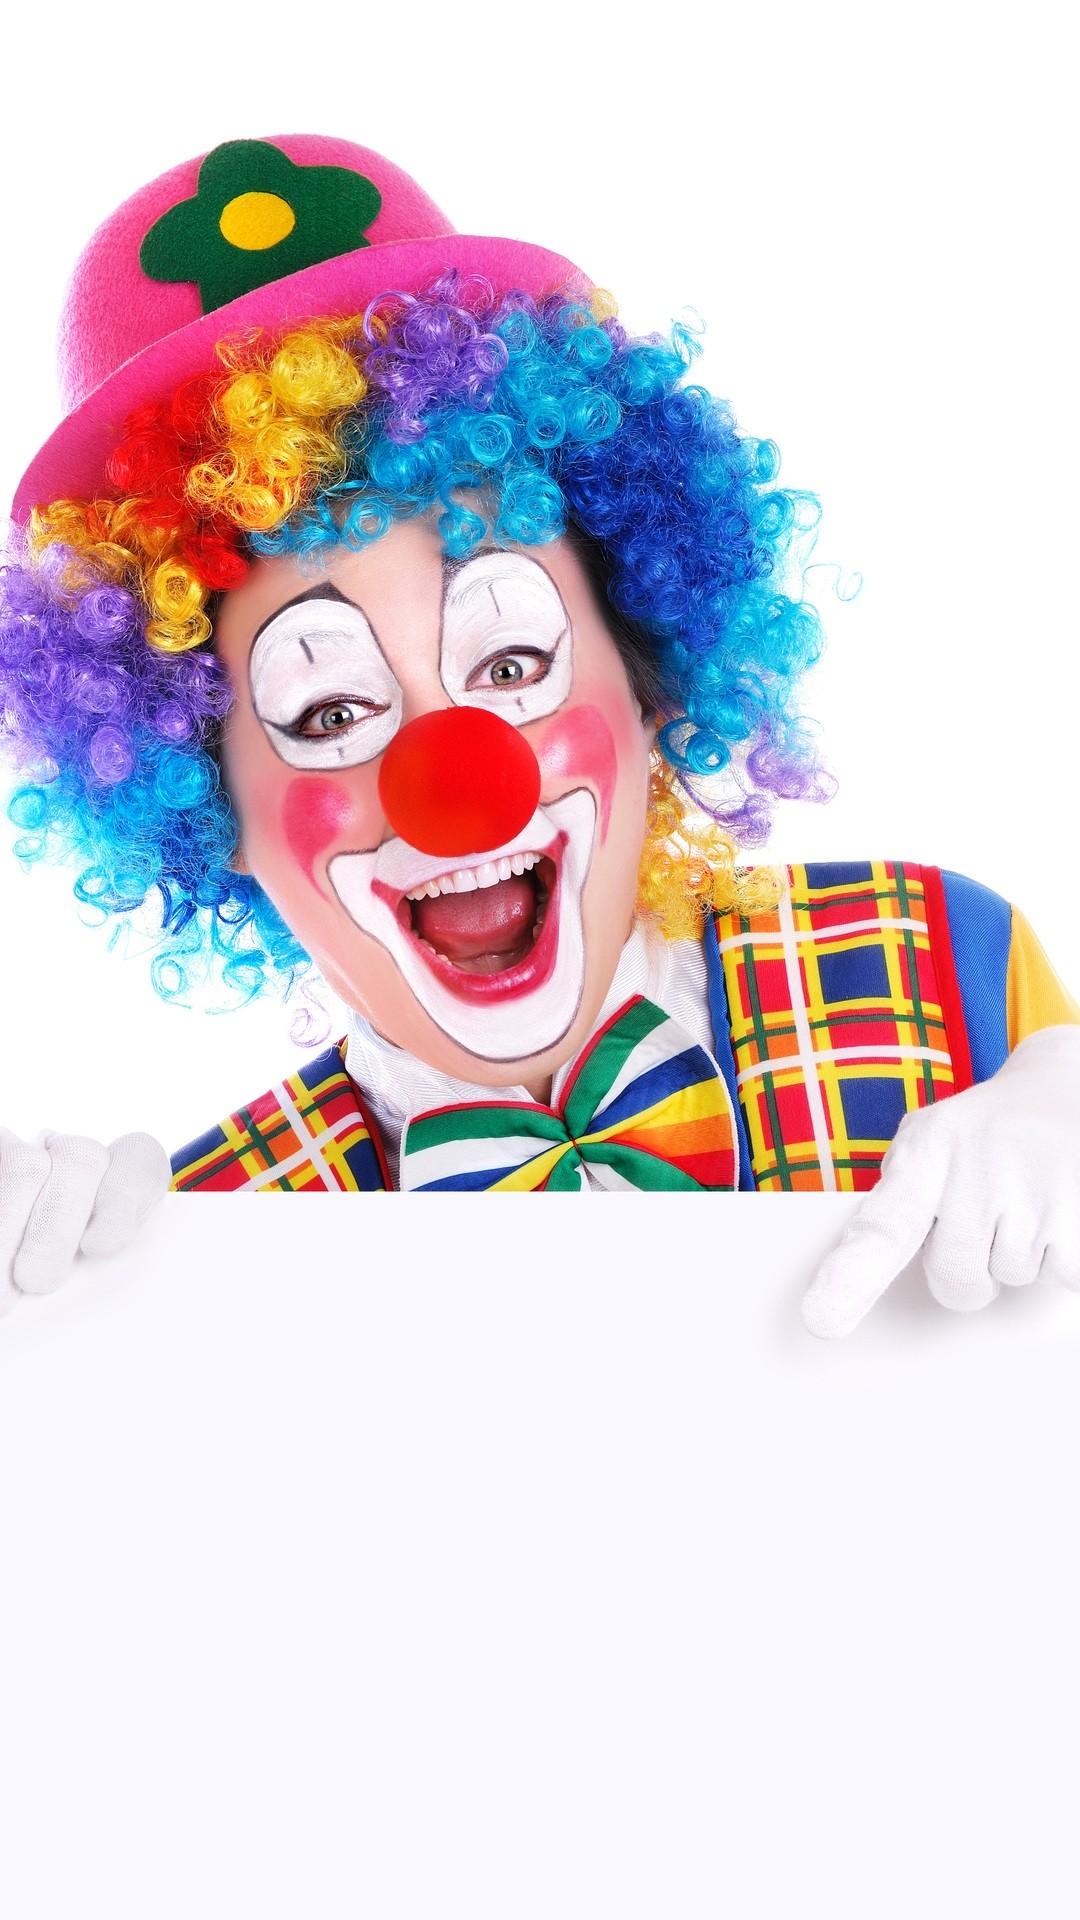 Clown wallpaper for iphone